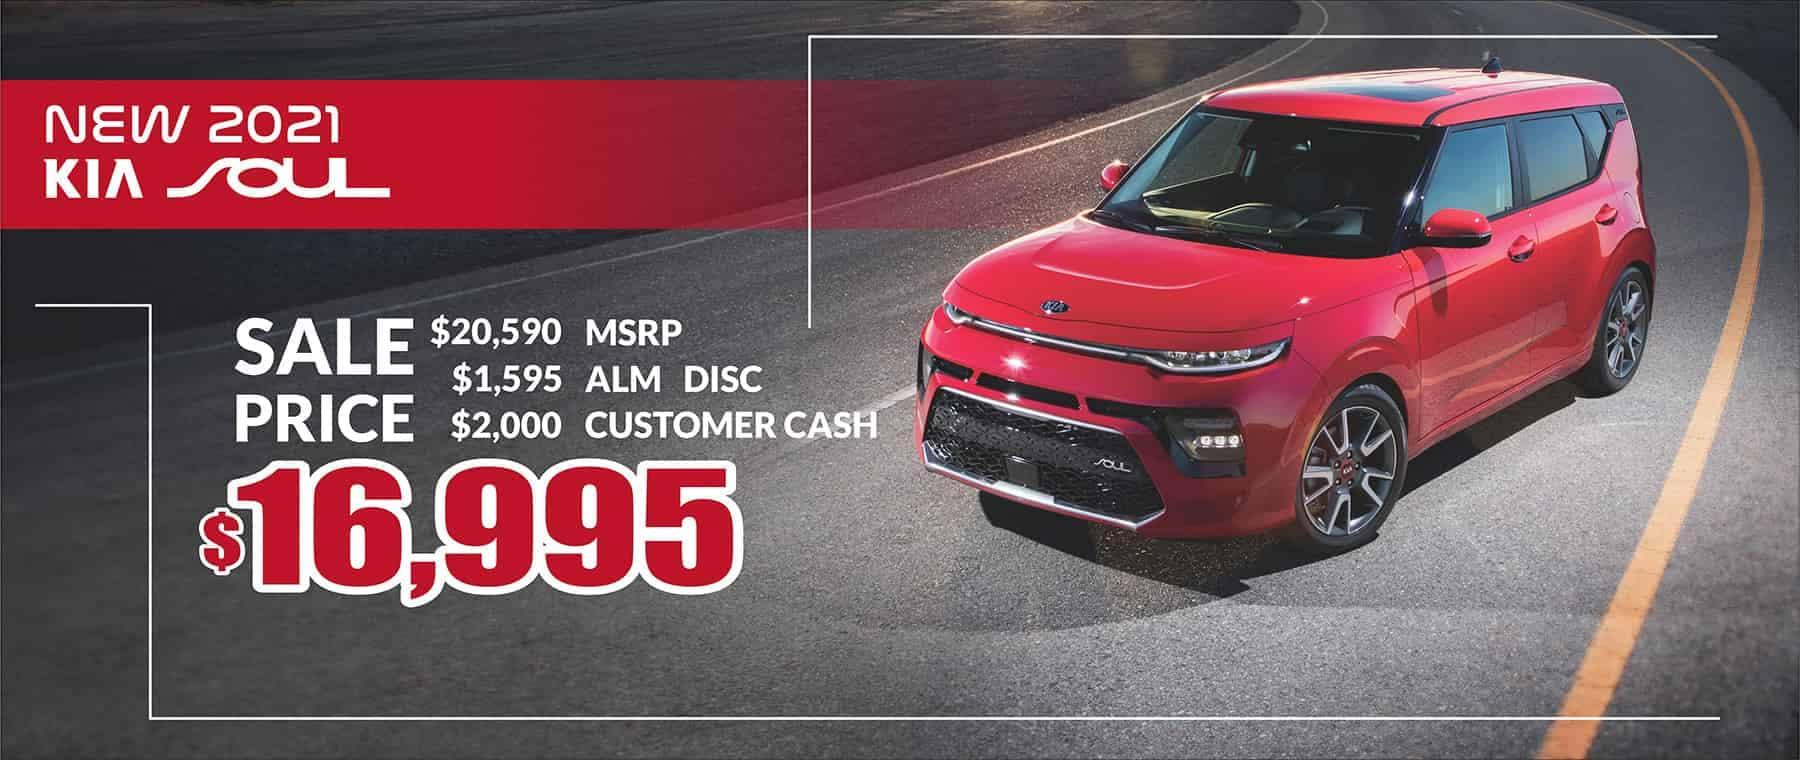 2021 Kia Soul Sale Price $16,995